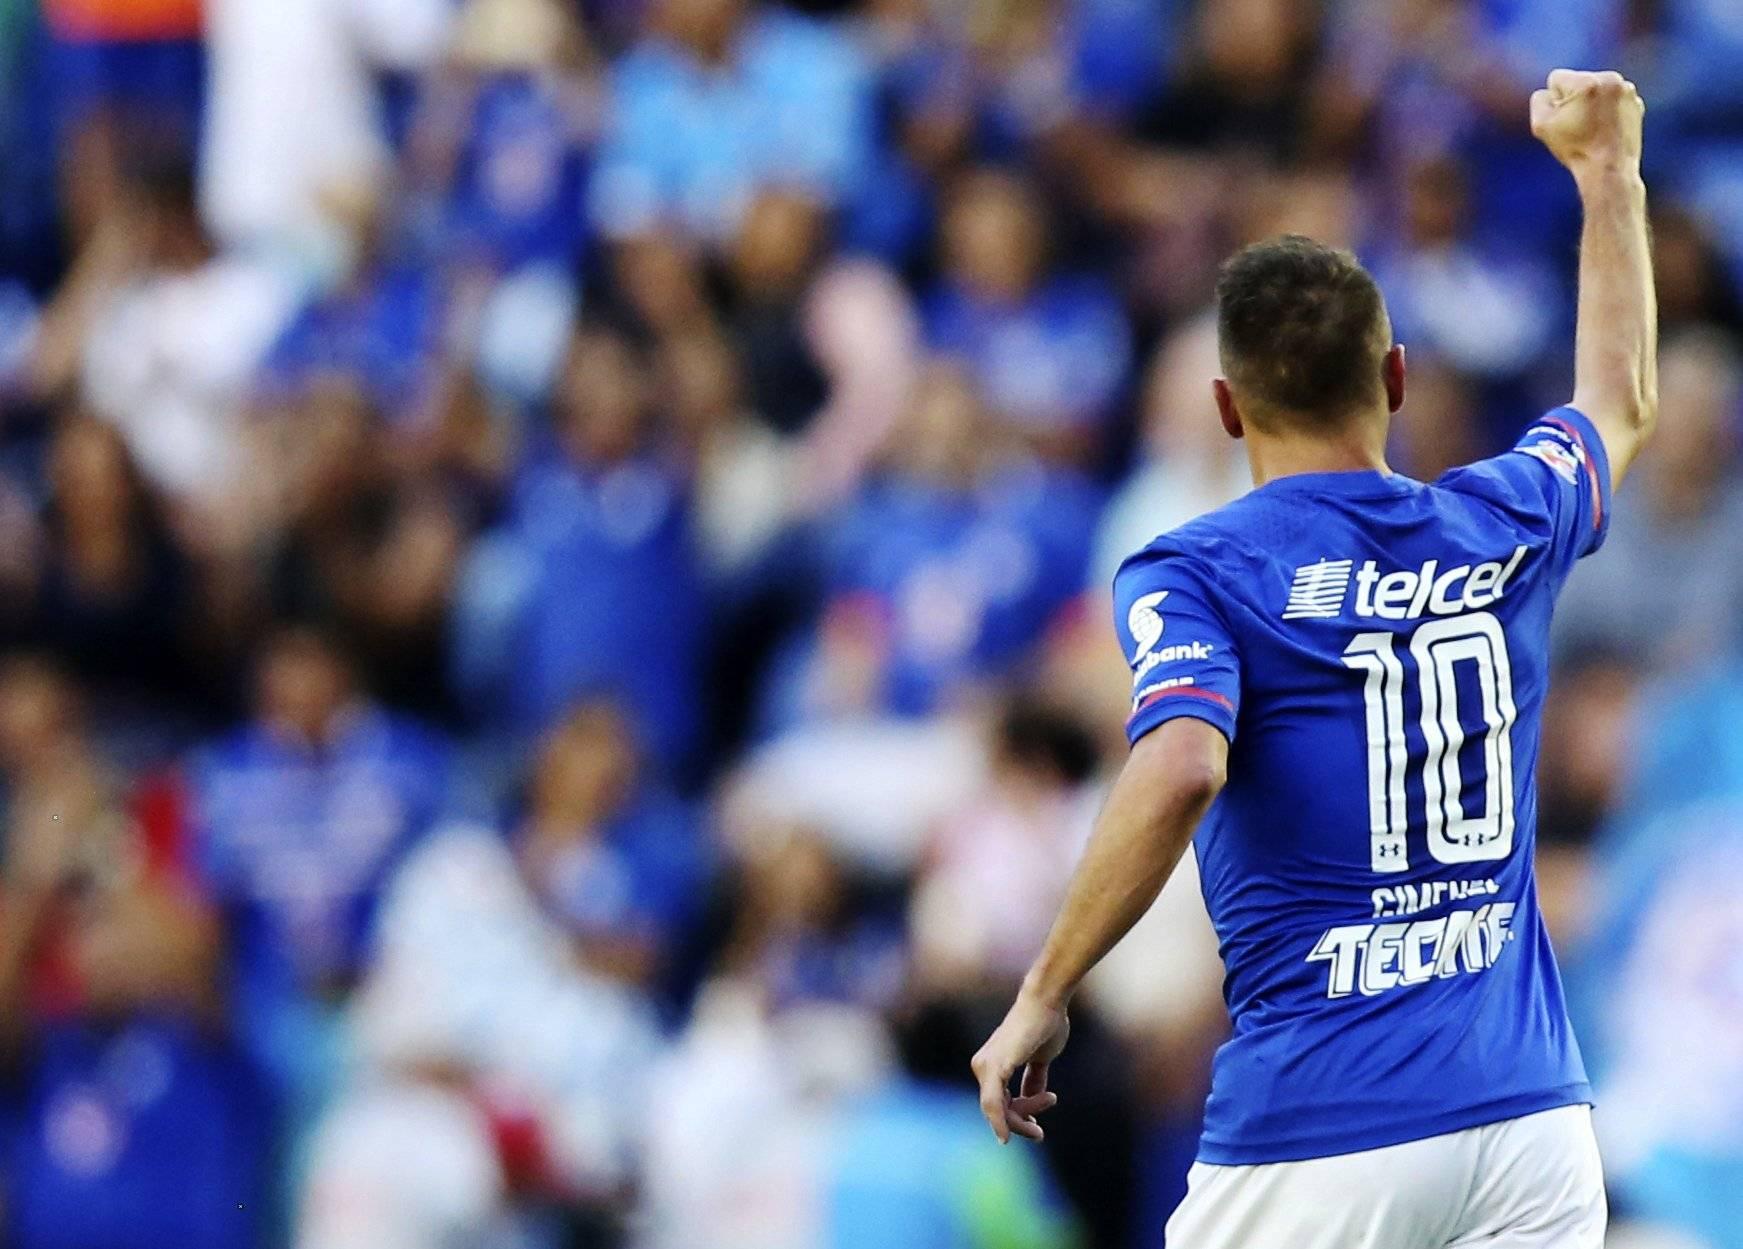 Regresa el fútbol a capital mexicana con Cruz Azul-América